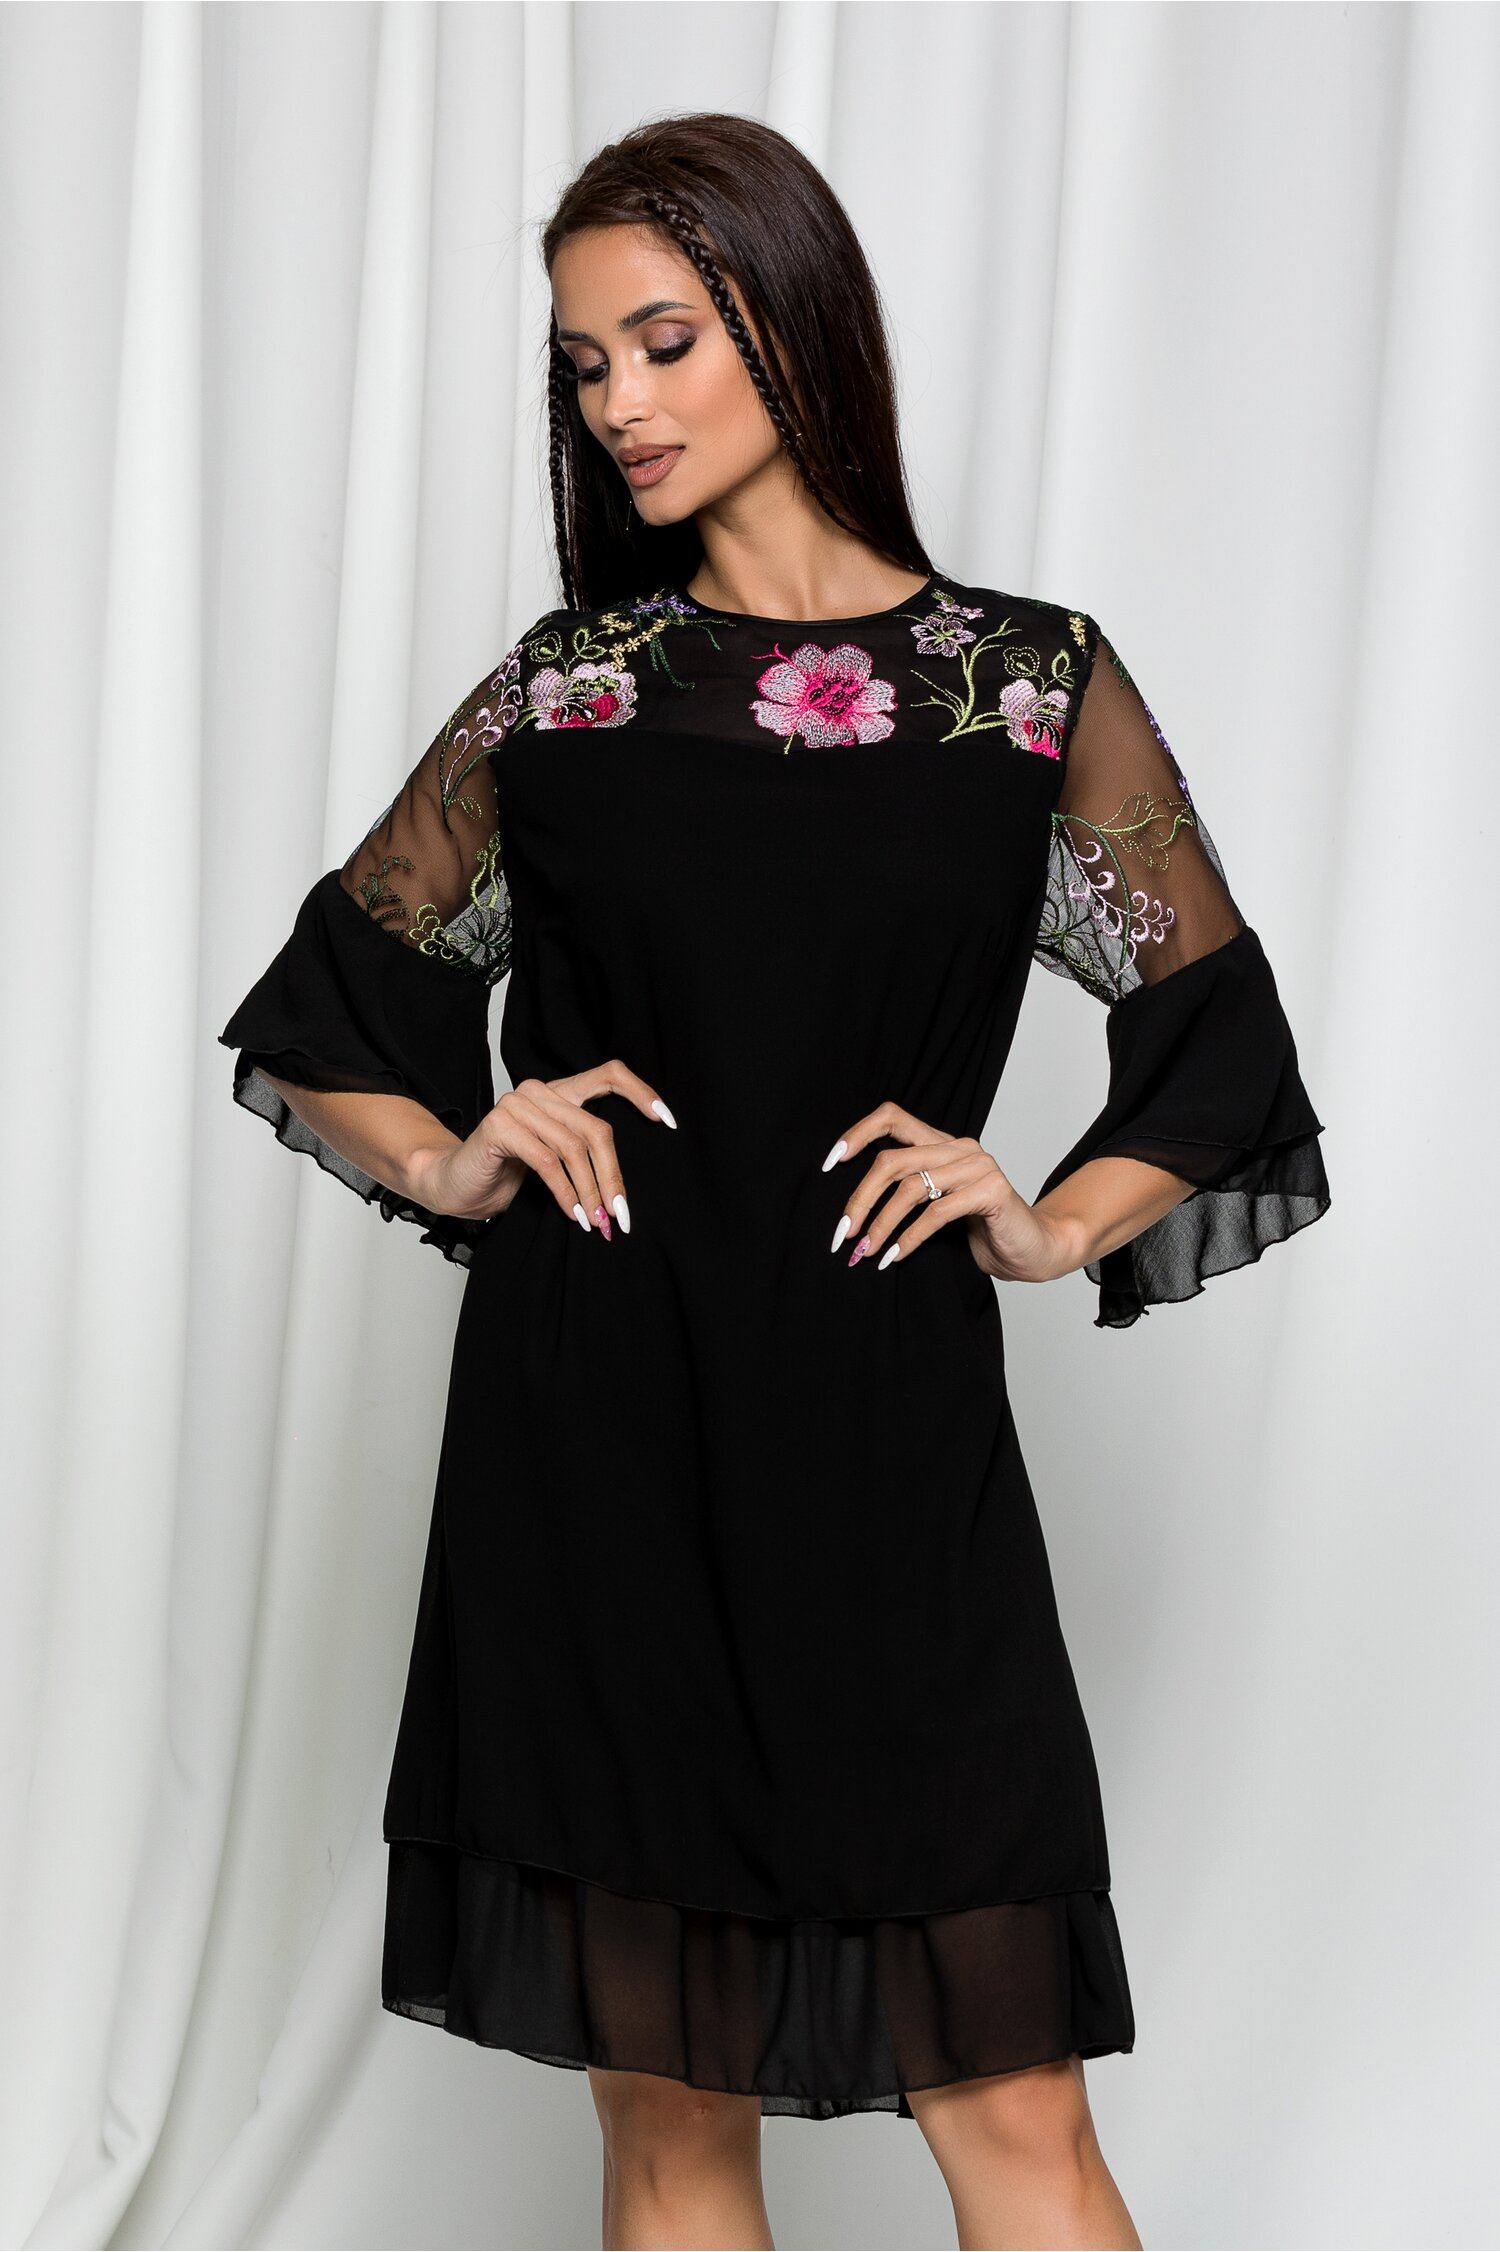 Rochie Ella Collection Doina neagra cu broderie florala si maneci tip clopot